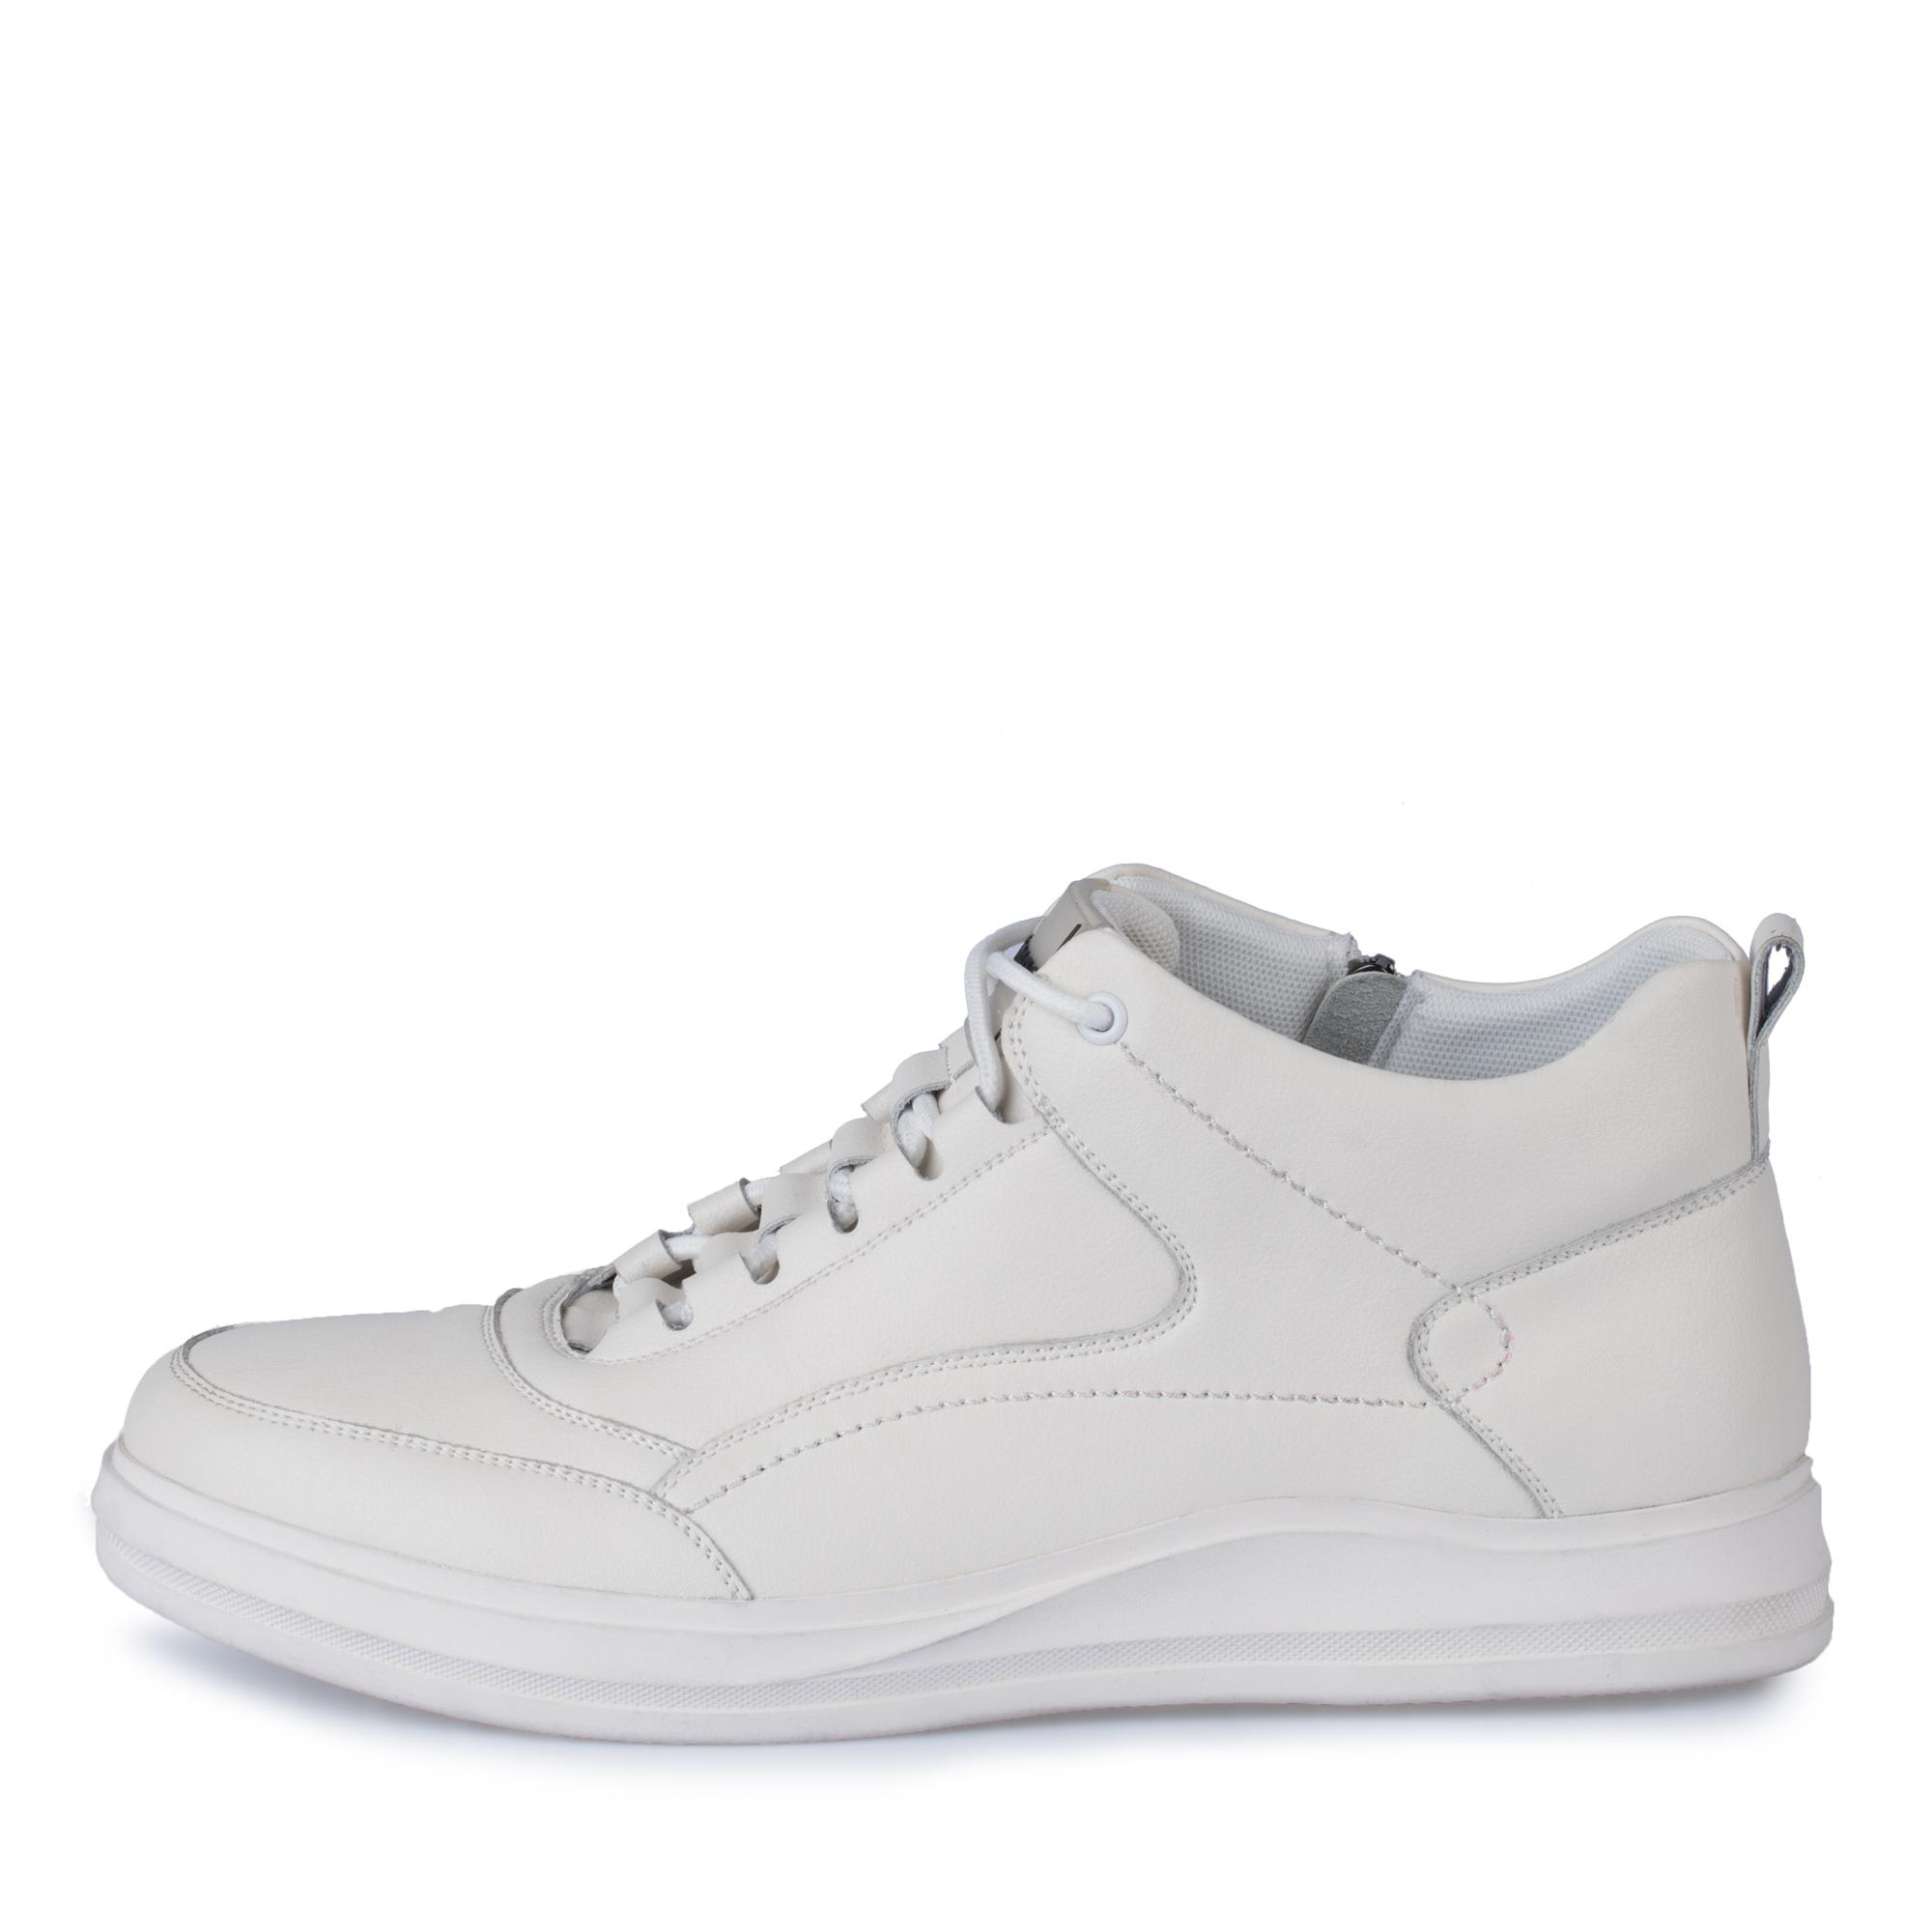 Ботинки BRIGGS 058-863A-2601